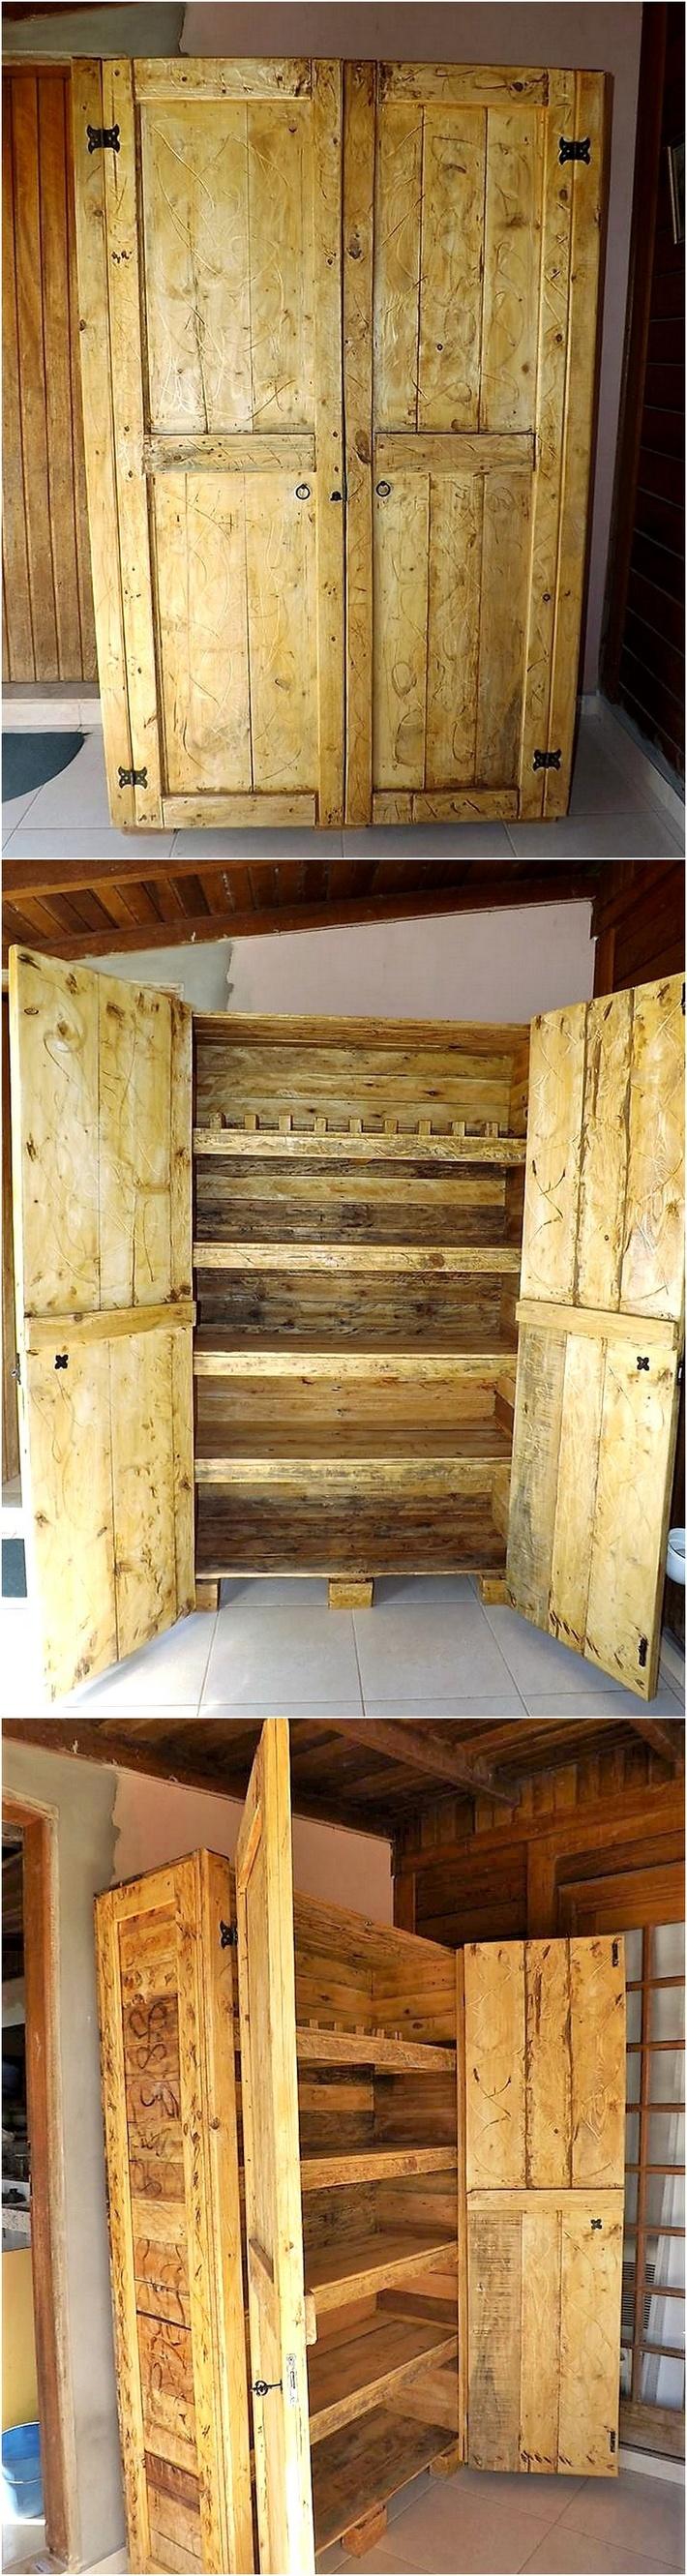 pallet-rustic-closet-cabinet